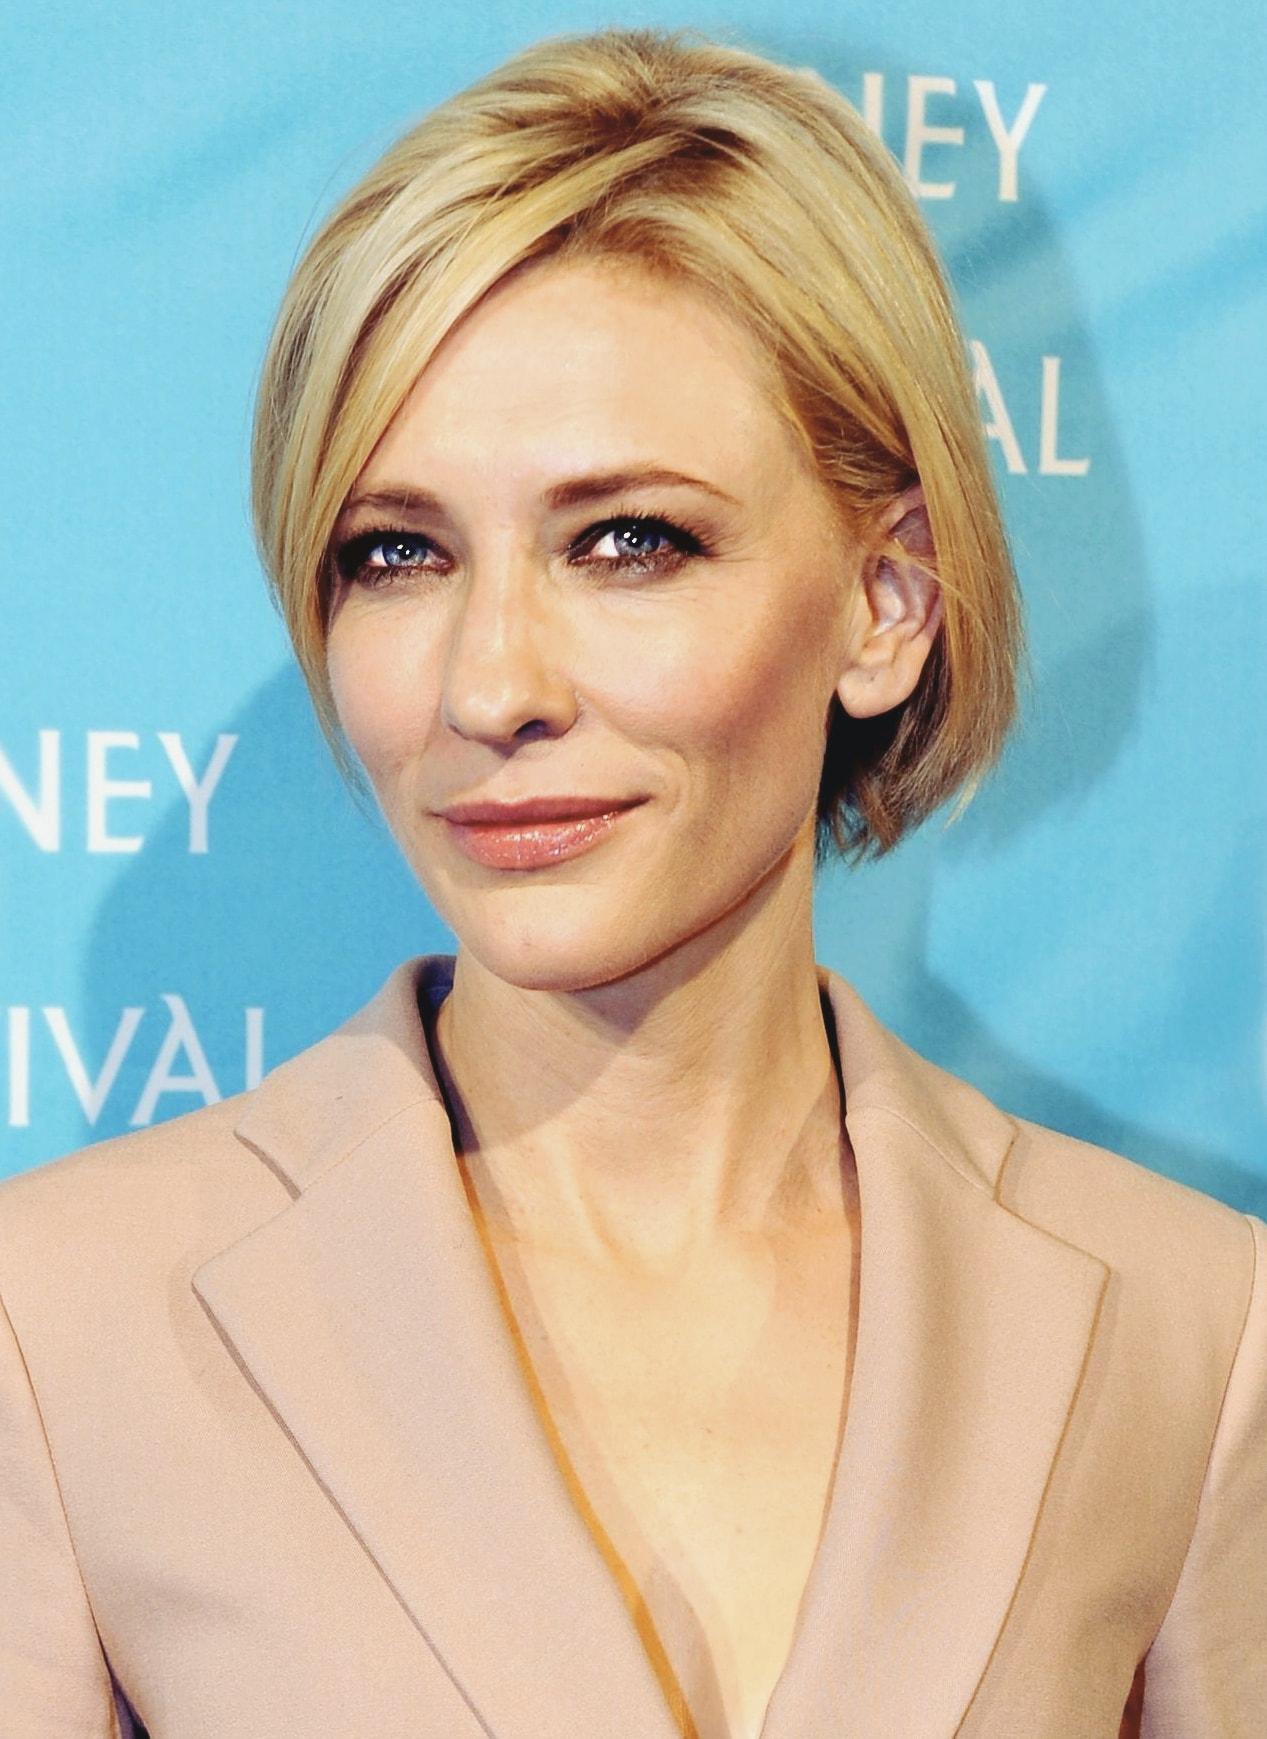 Cate Blanchett Full hd wallpapers